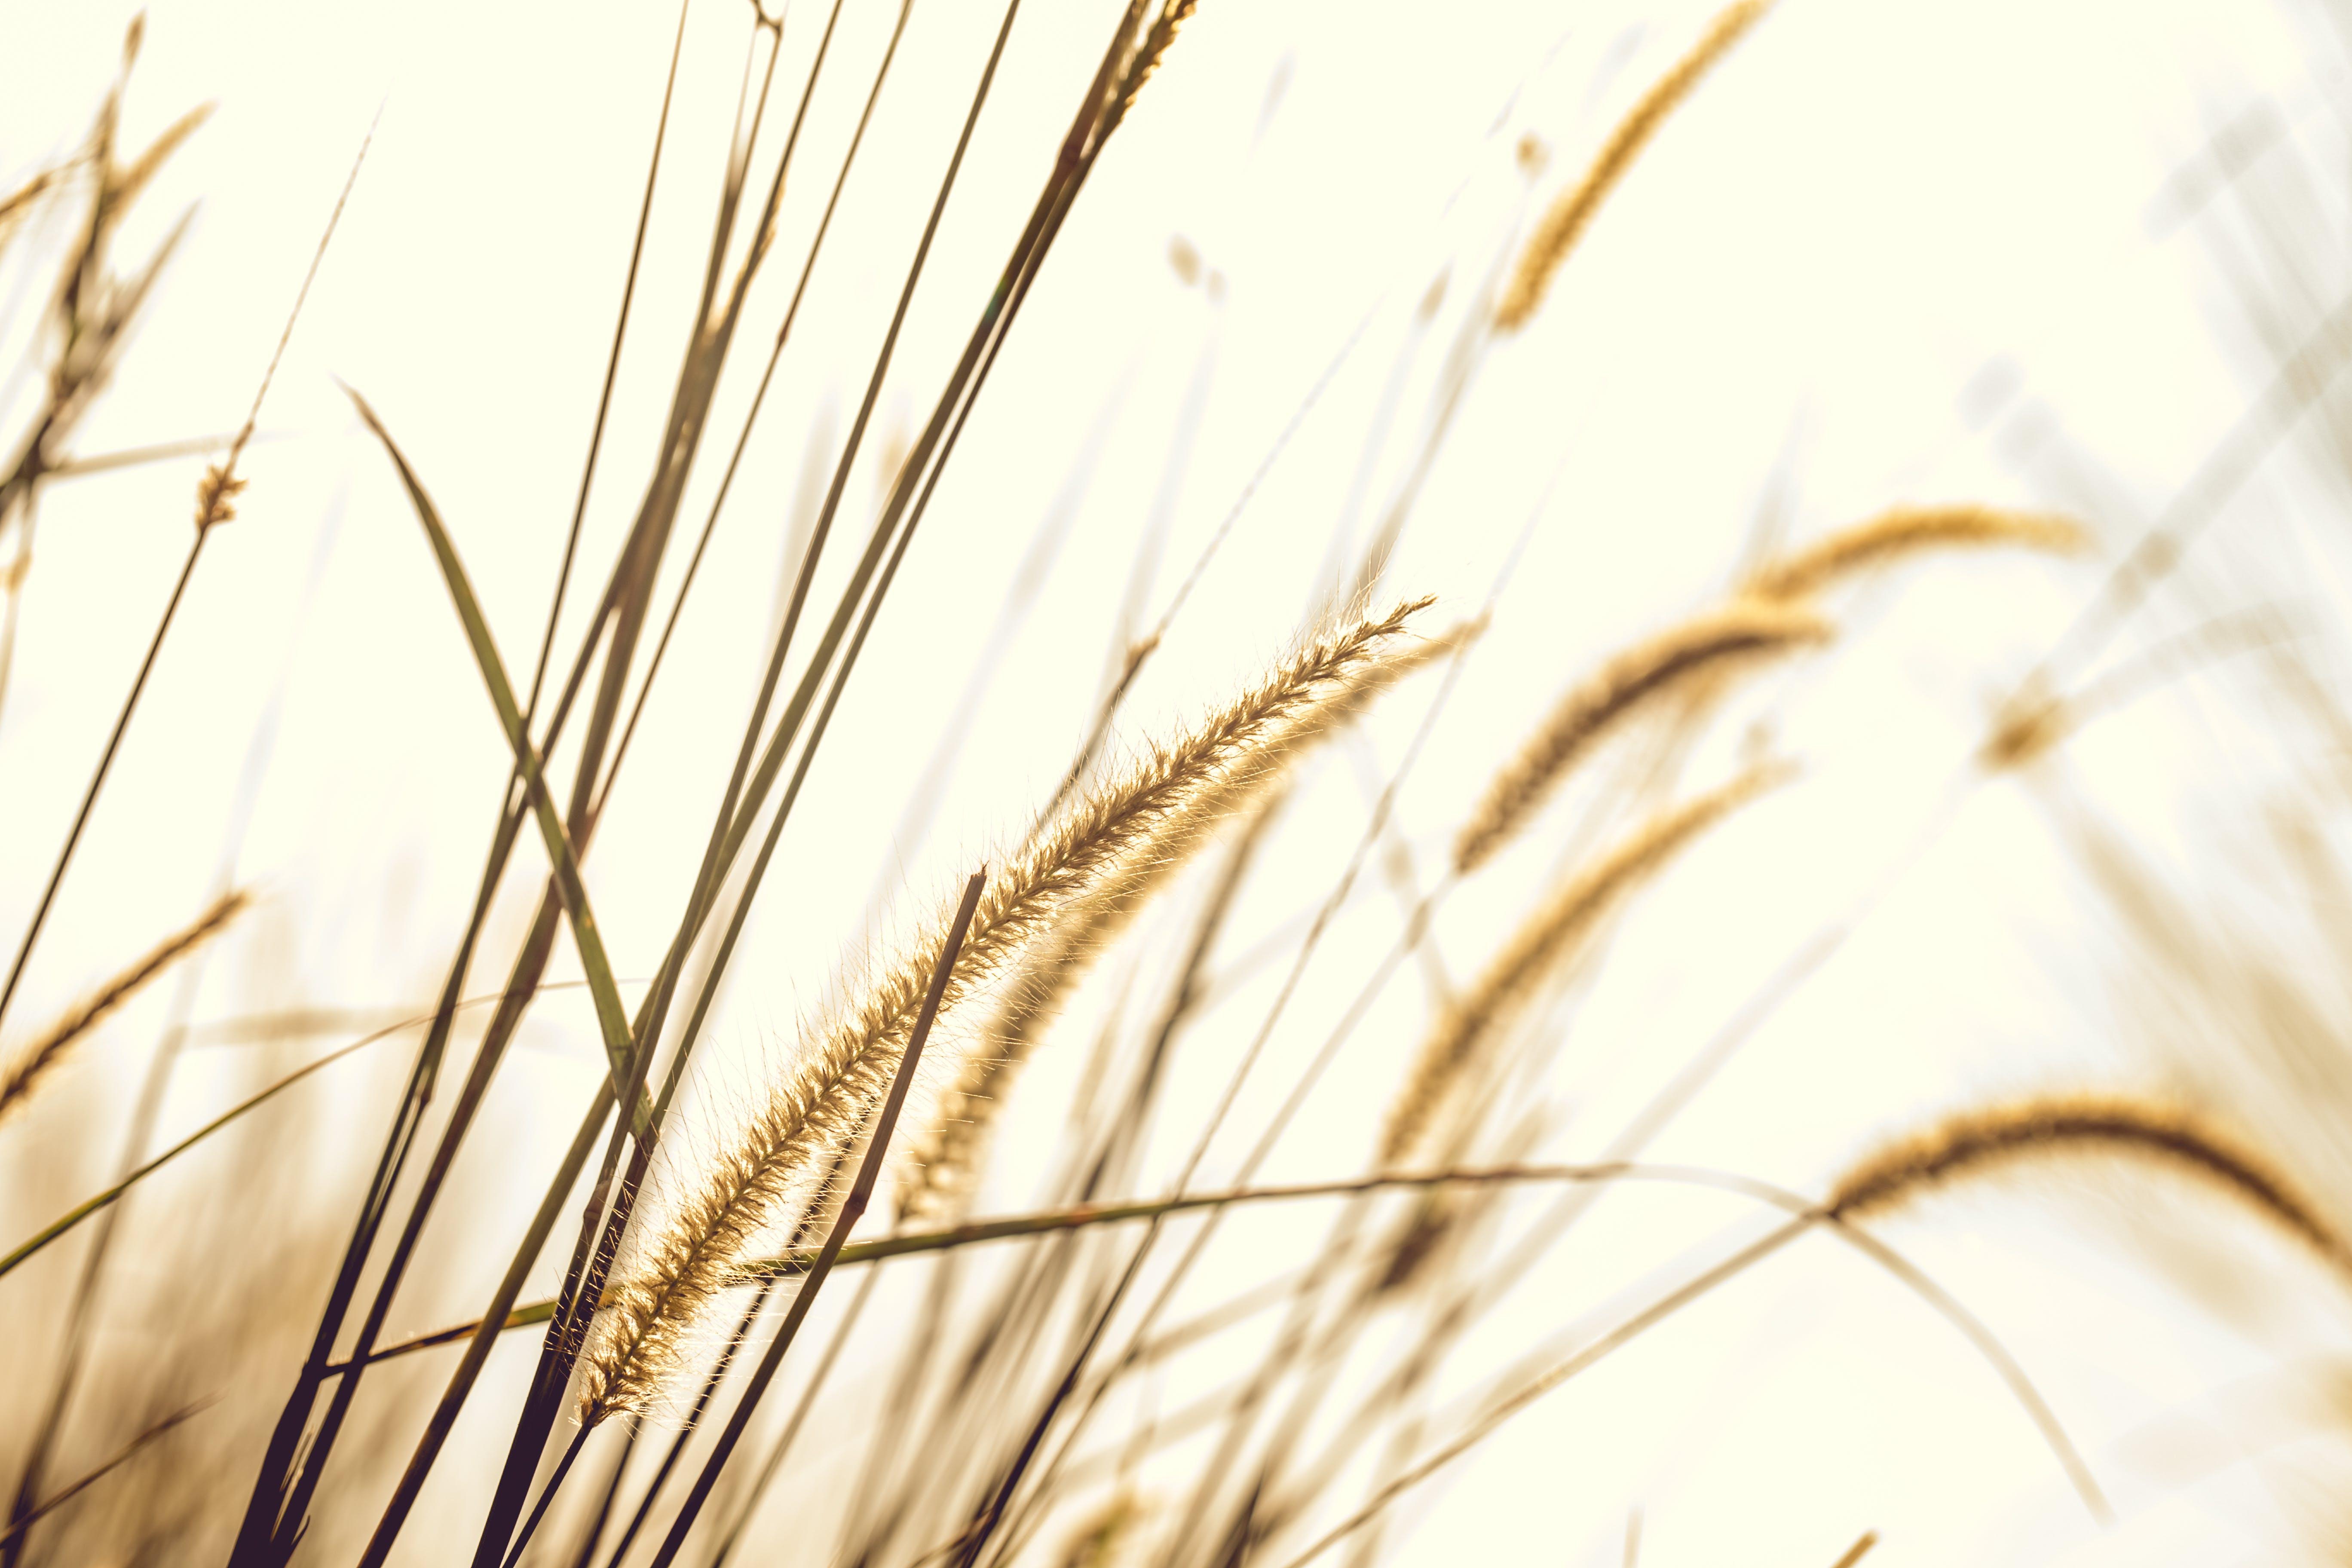 Brown Fountain Grass Closeup Photography